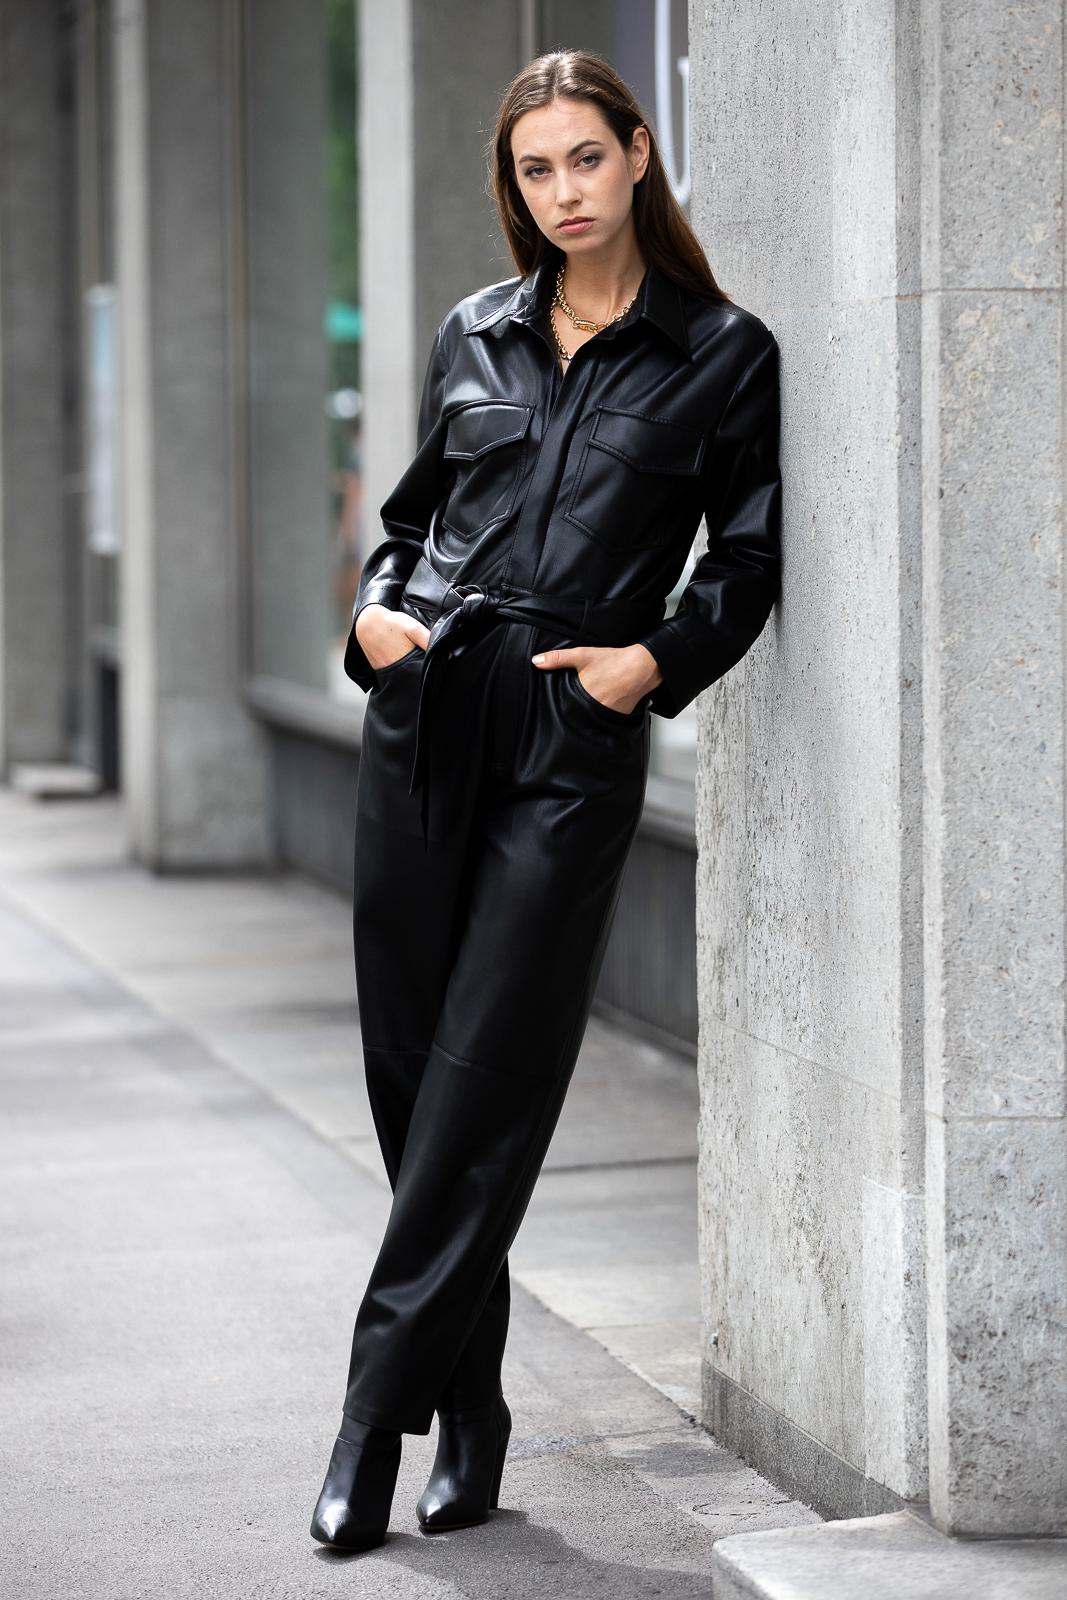 Daily Outfits, Nanushka, Laura Lombardi, Isabel Marant, Vestibule, Zurich